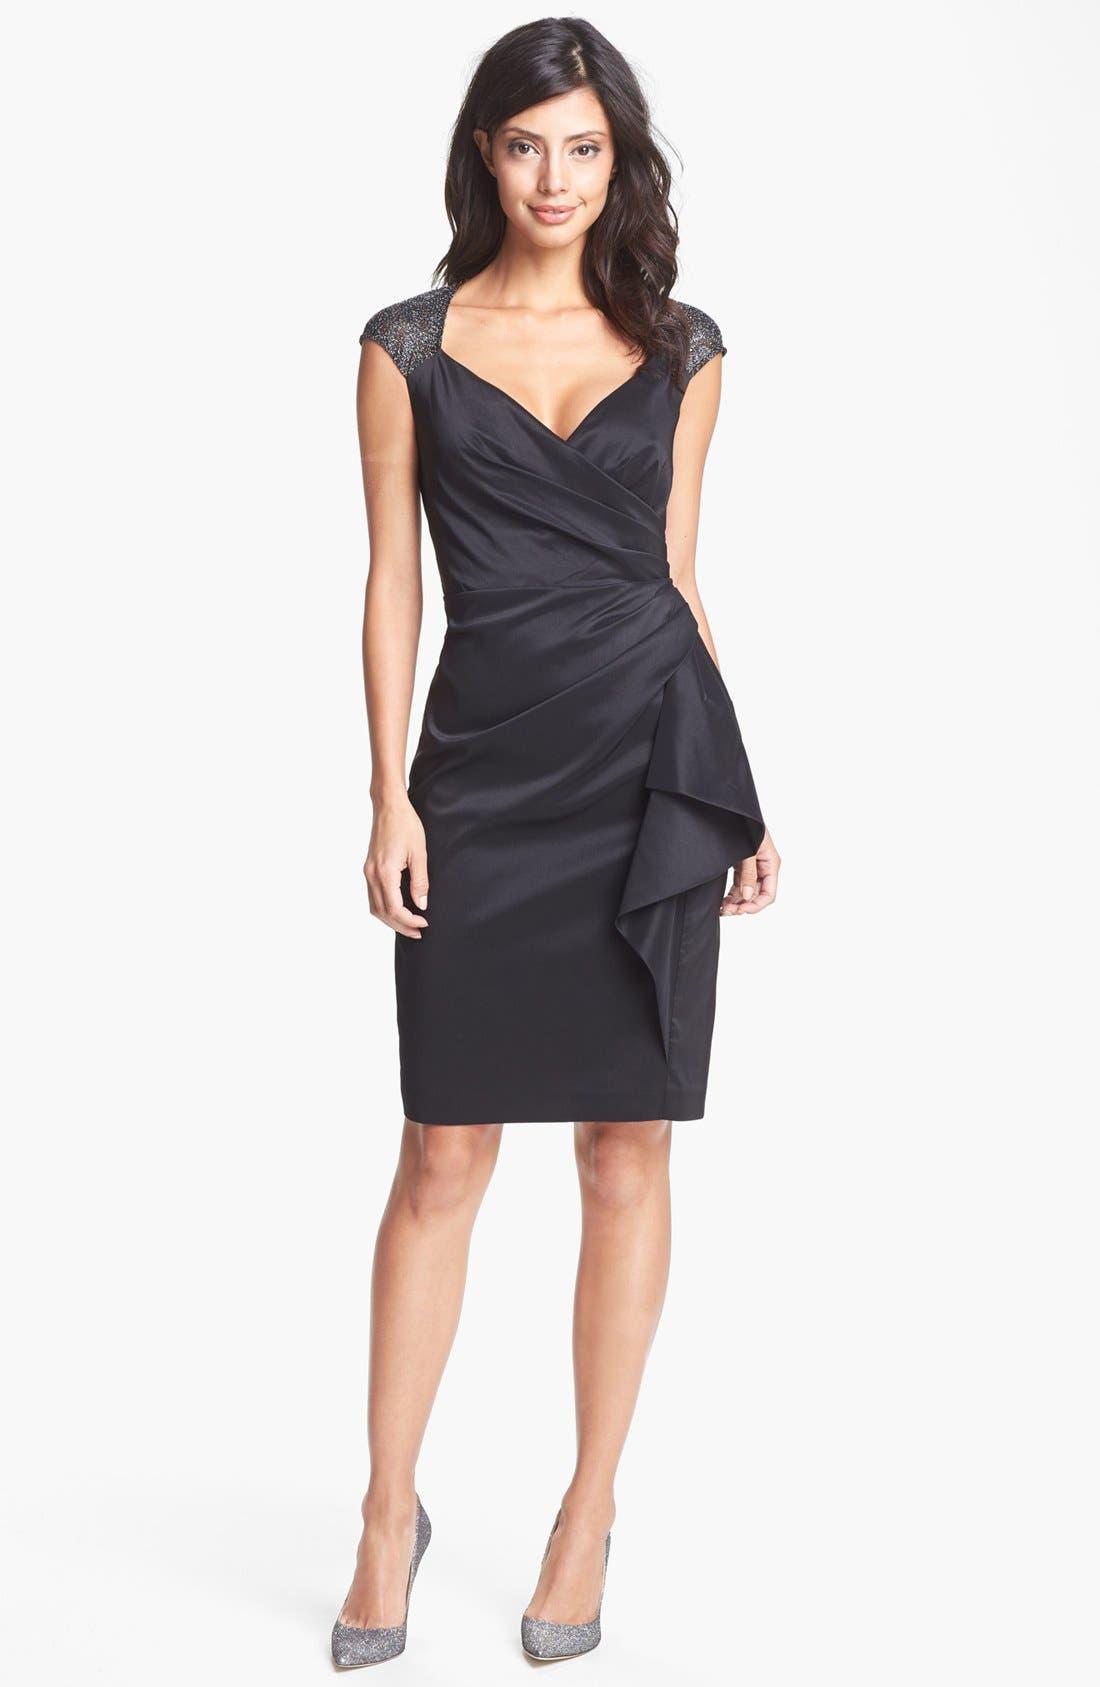 Alternate Image 1 Selected - Maggy London Metallic Lace & Draped Taffeta Sheath Dress